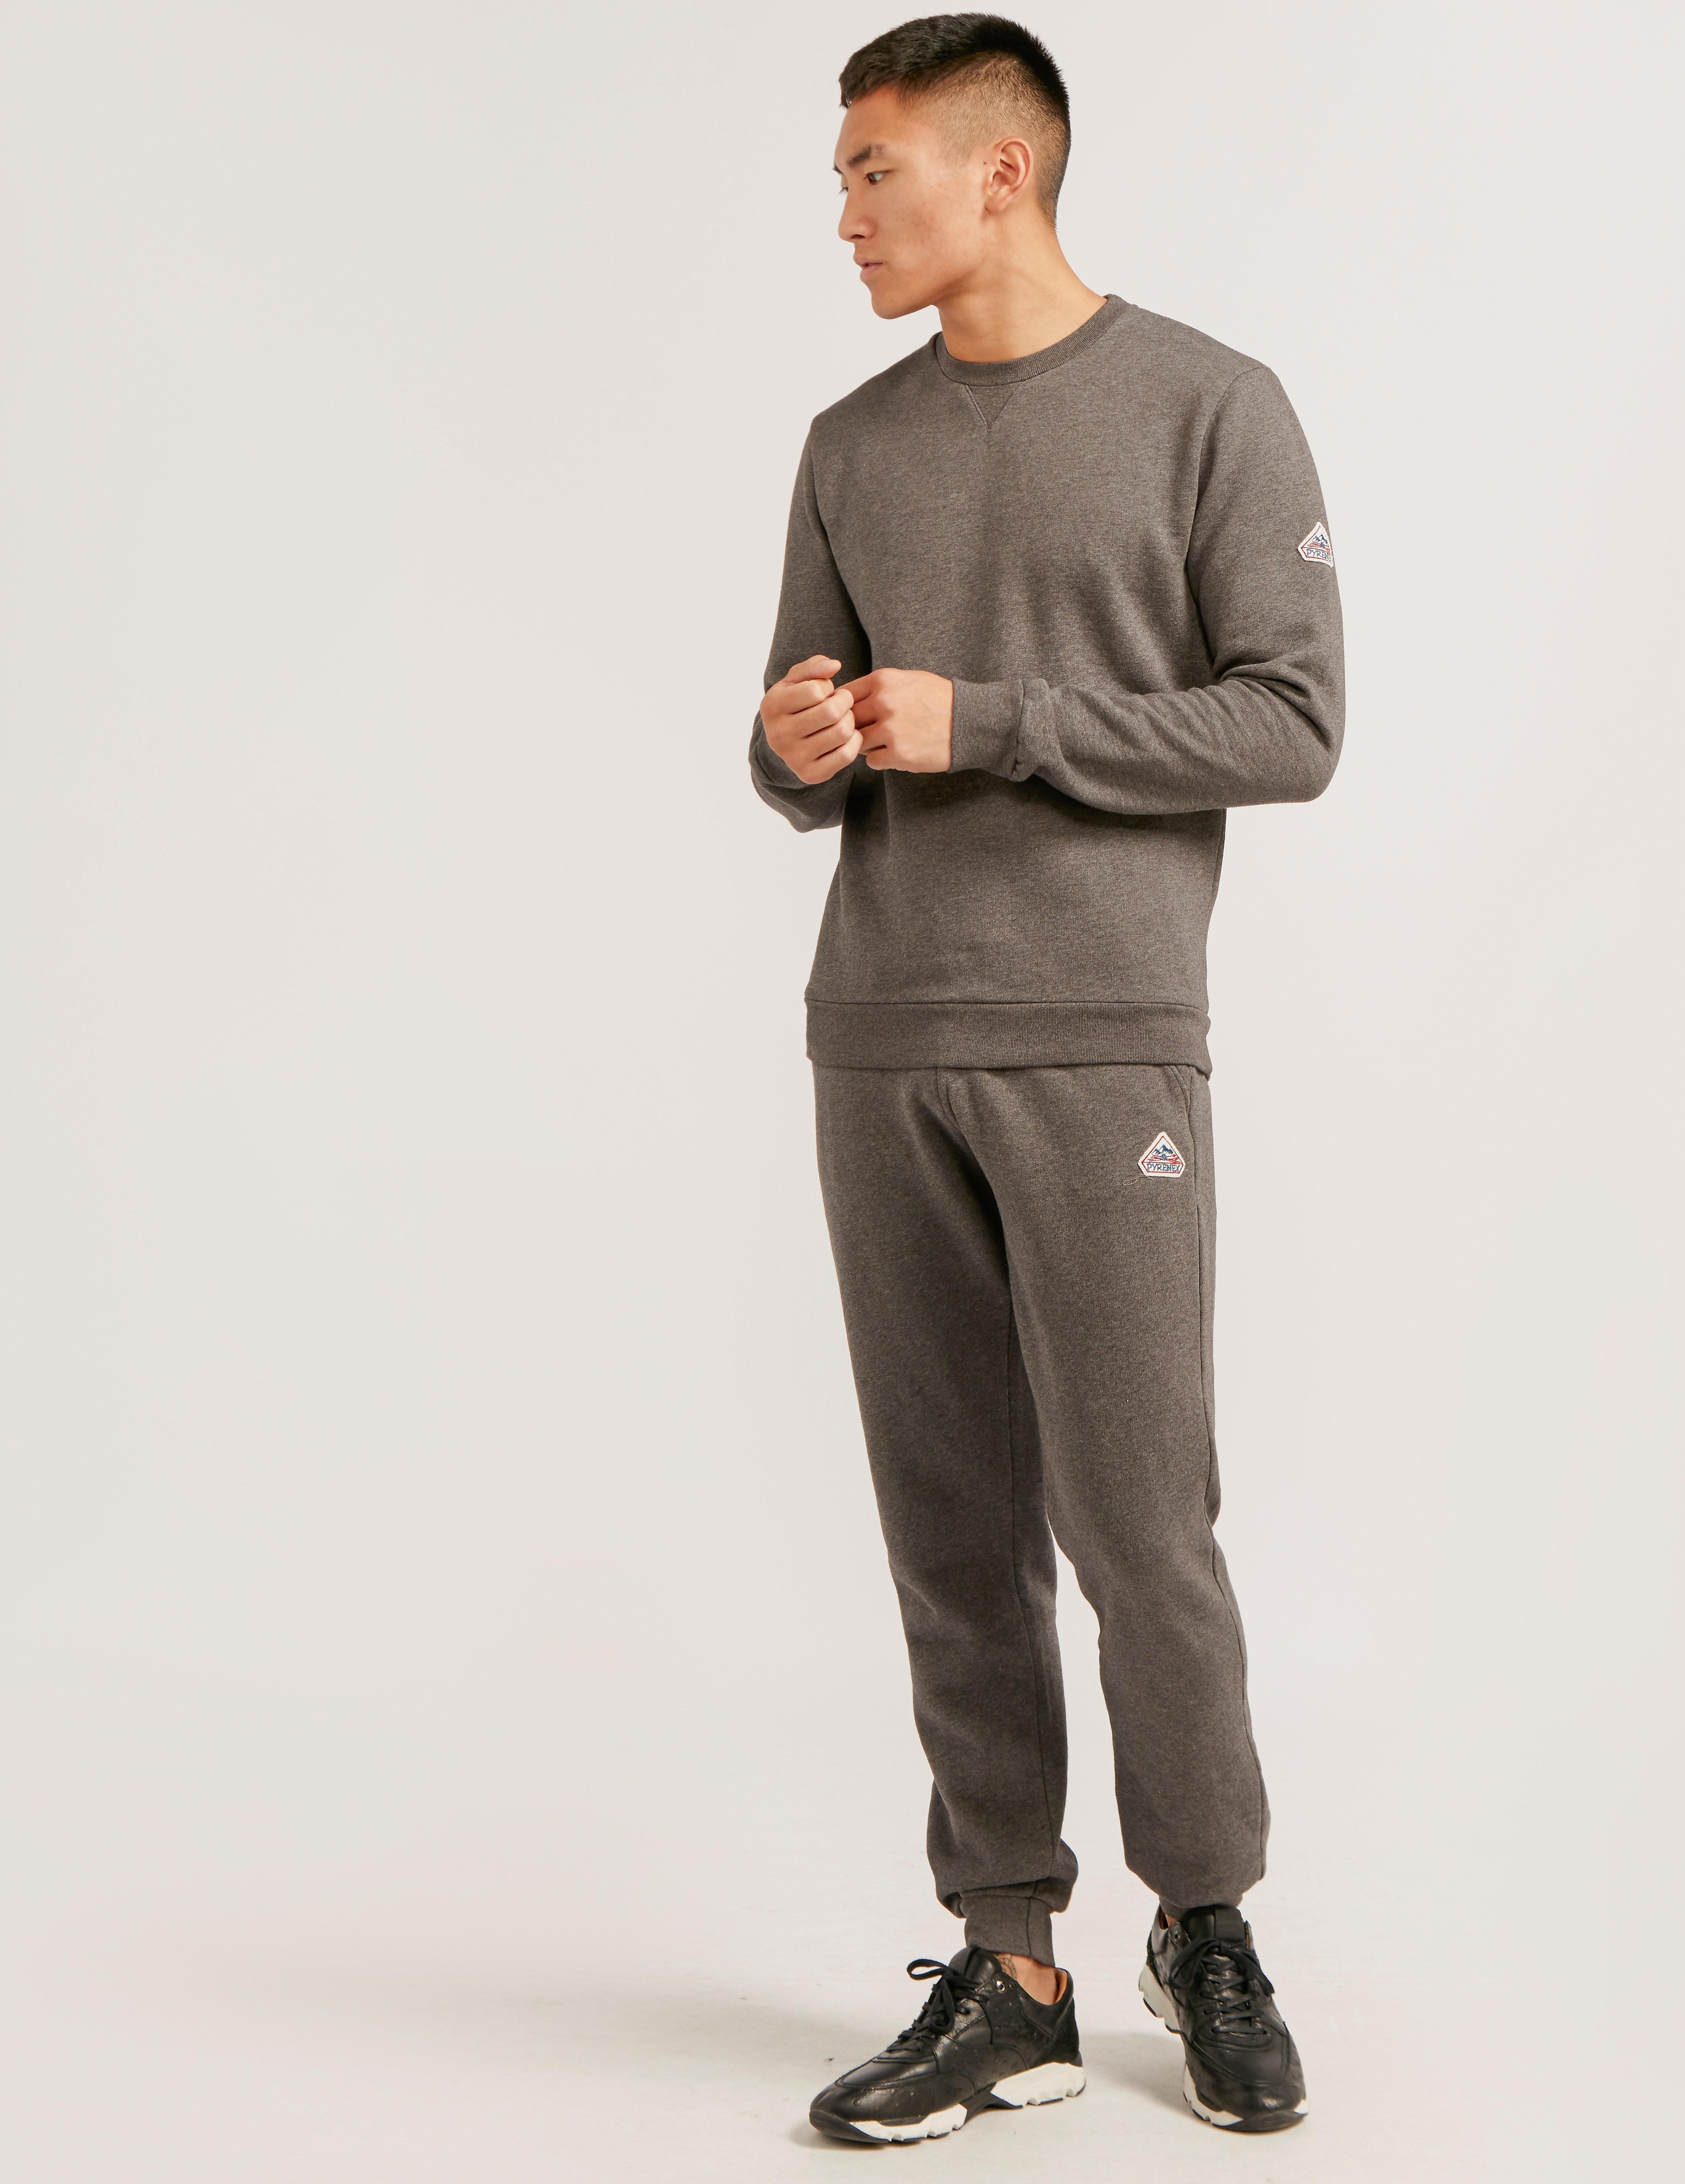 Pyrenex Sweatshirt